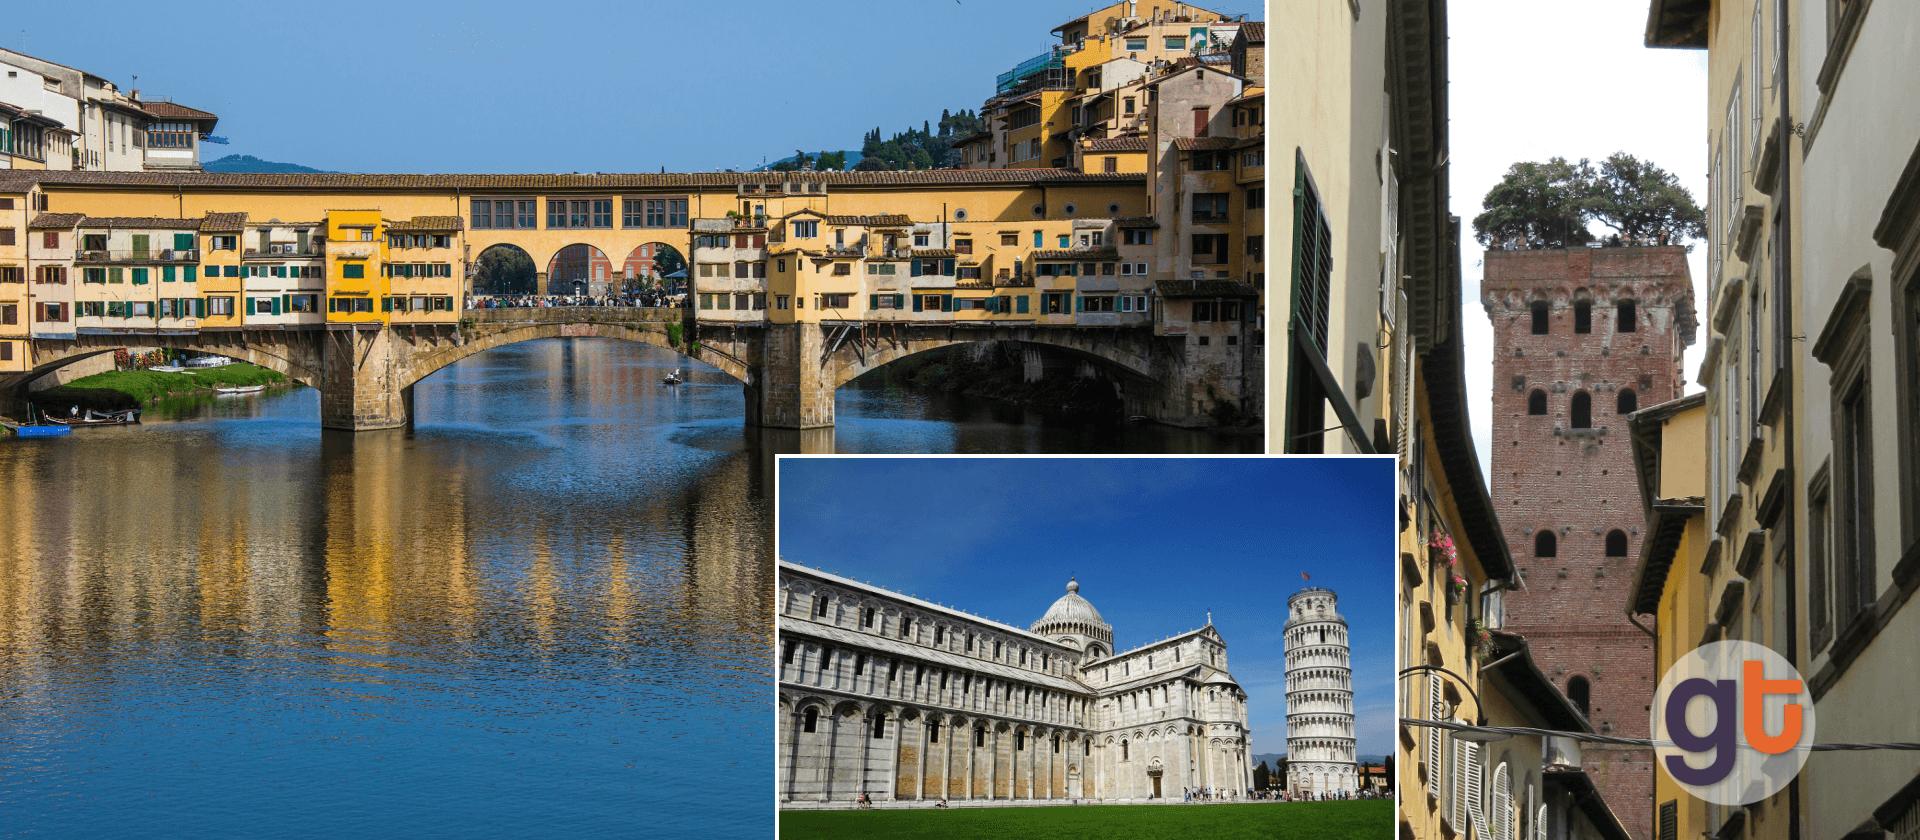 8 дней в романтической Тоскане с 22.05.17 по 29.05.17